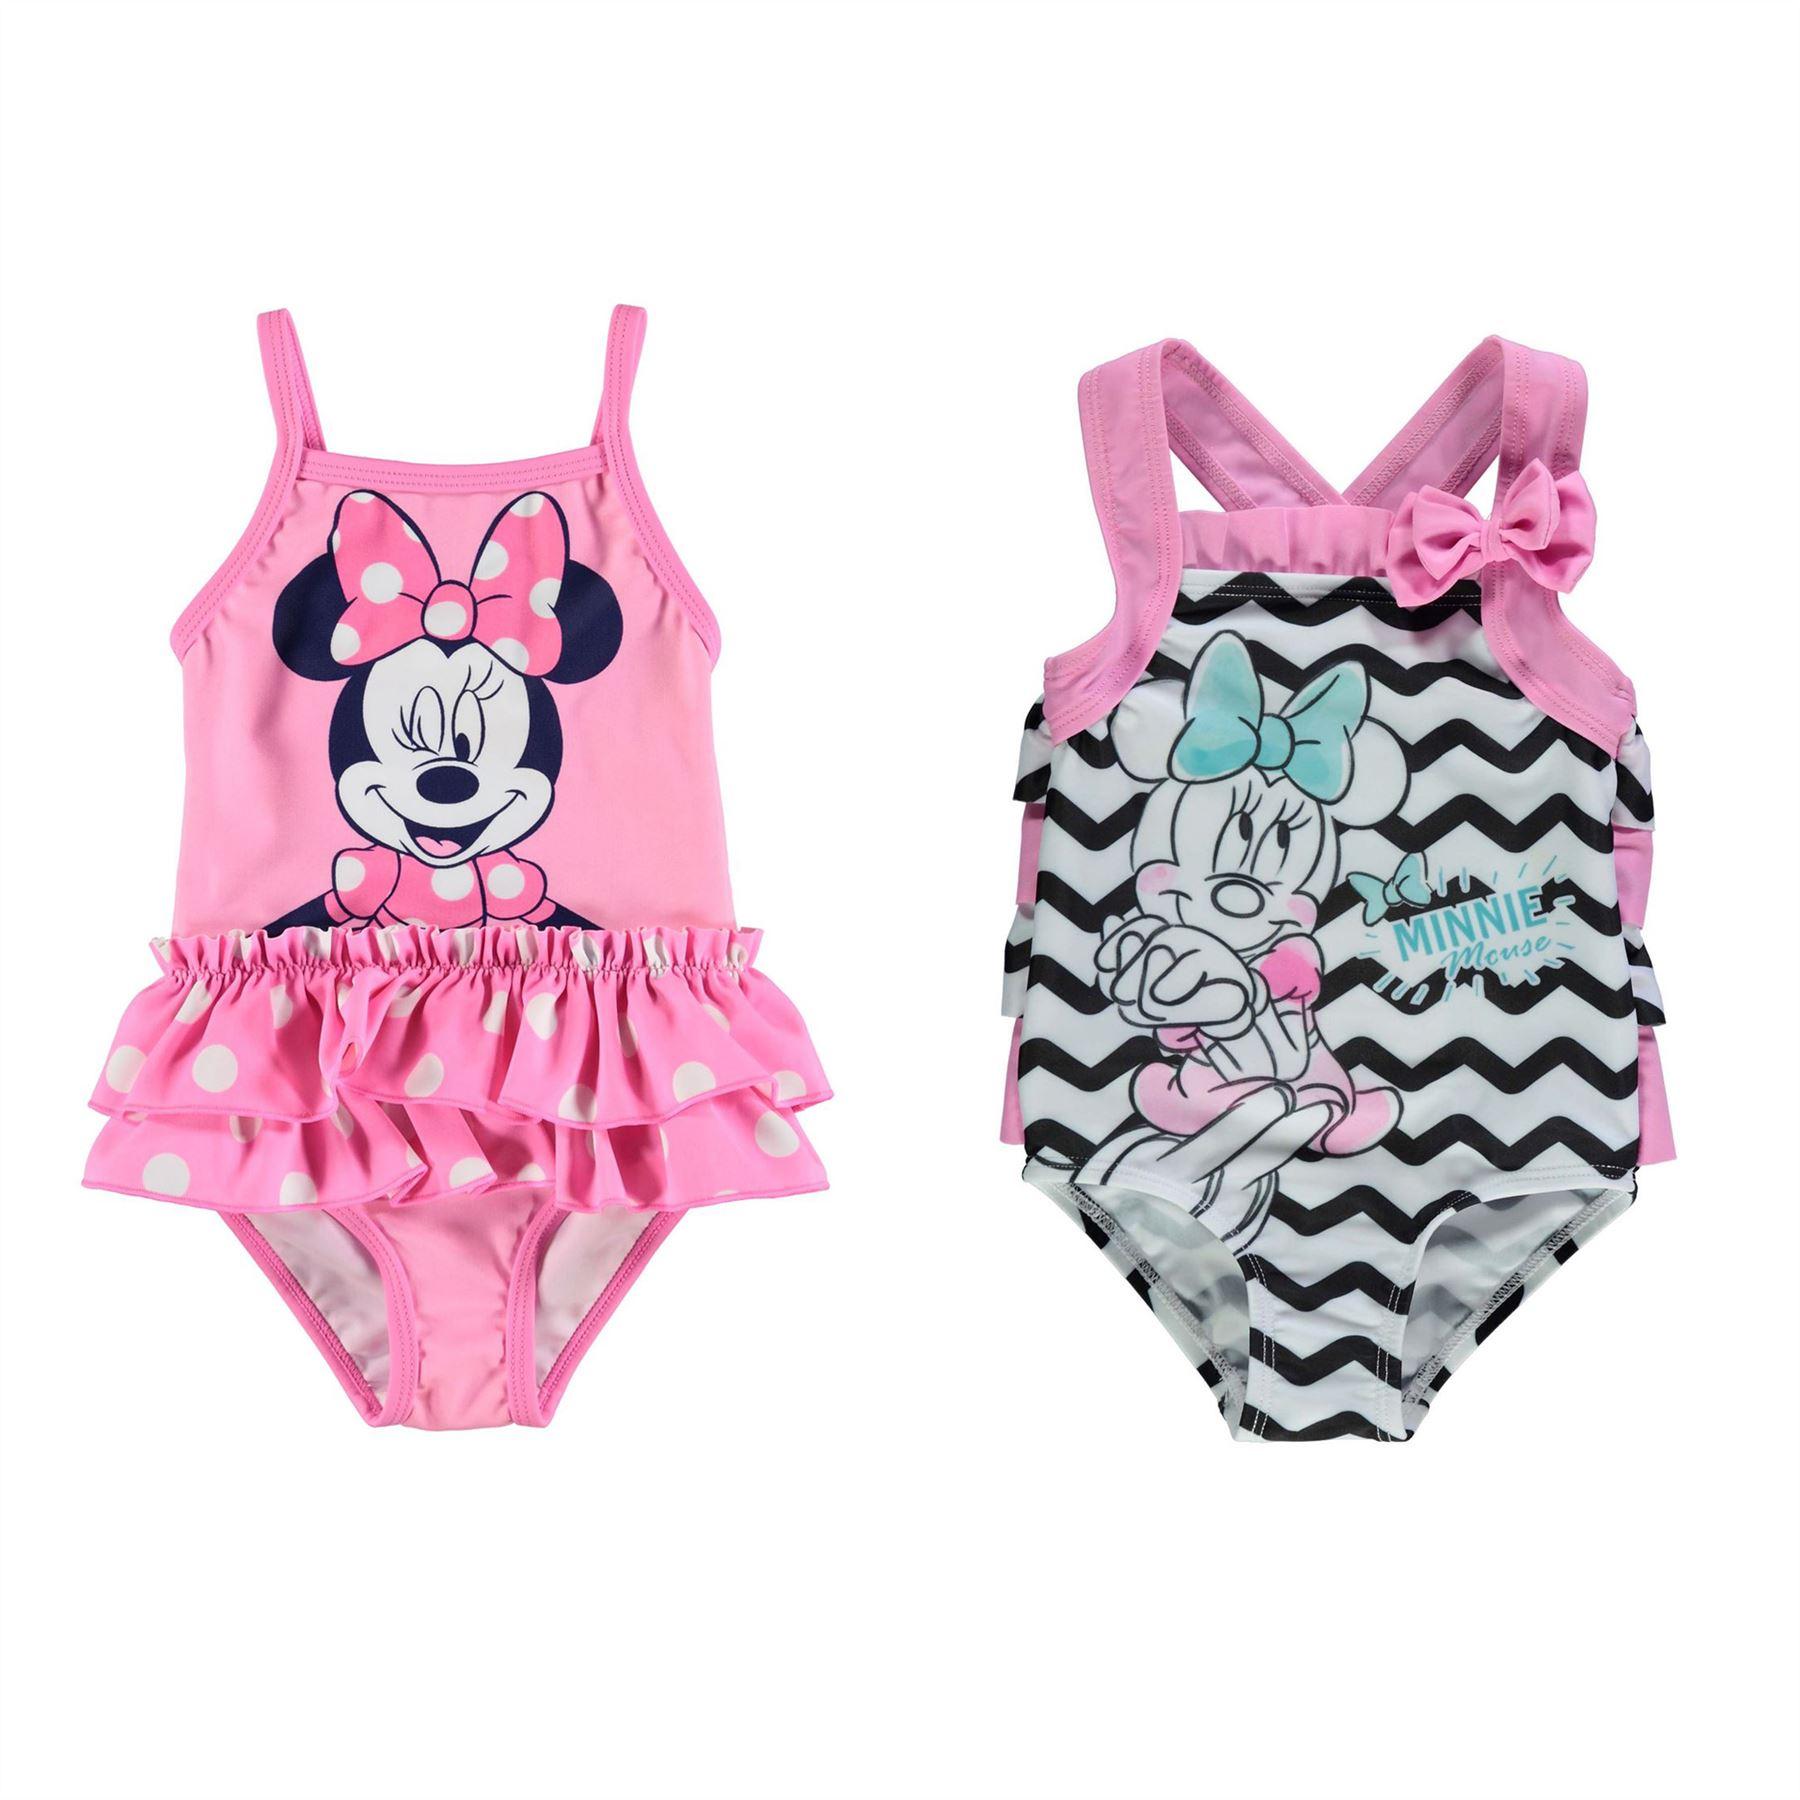 06b60a09d ... Minnie Mouse Swimsuit Infant Baby Girls Swimwear Bathing Costume  Beachwear ...